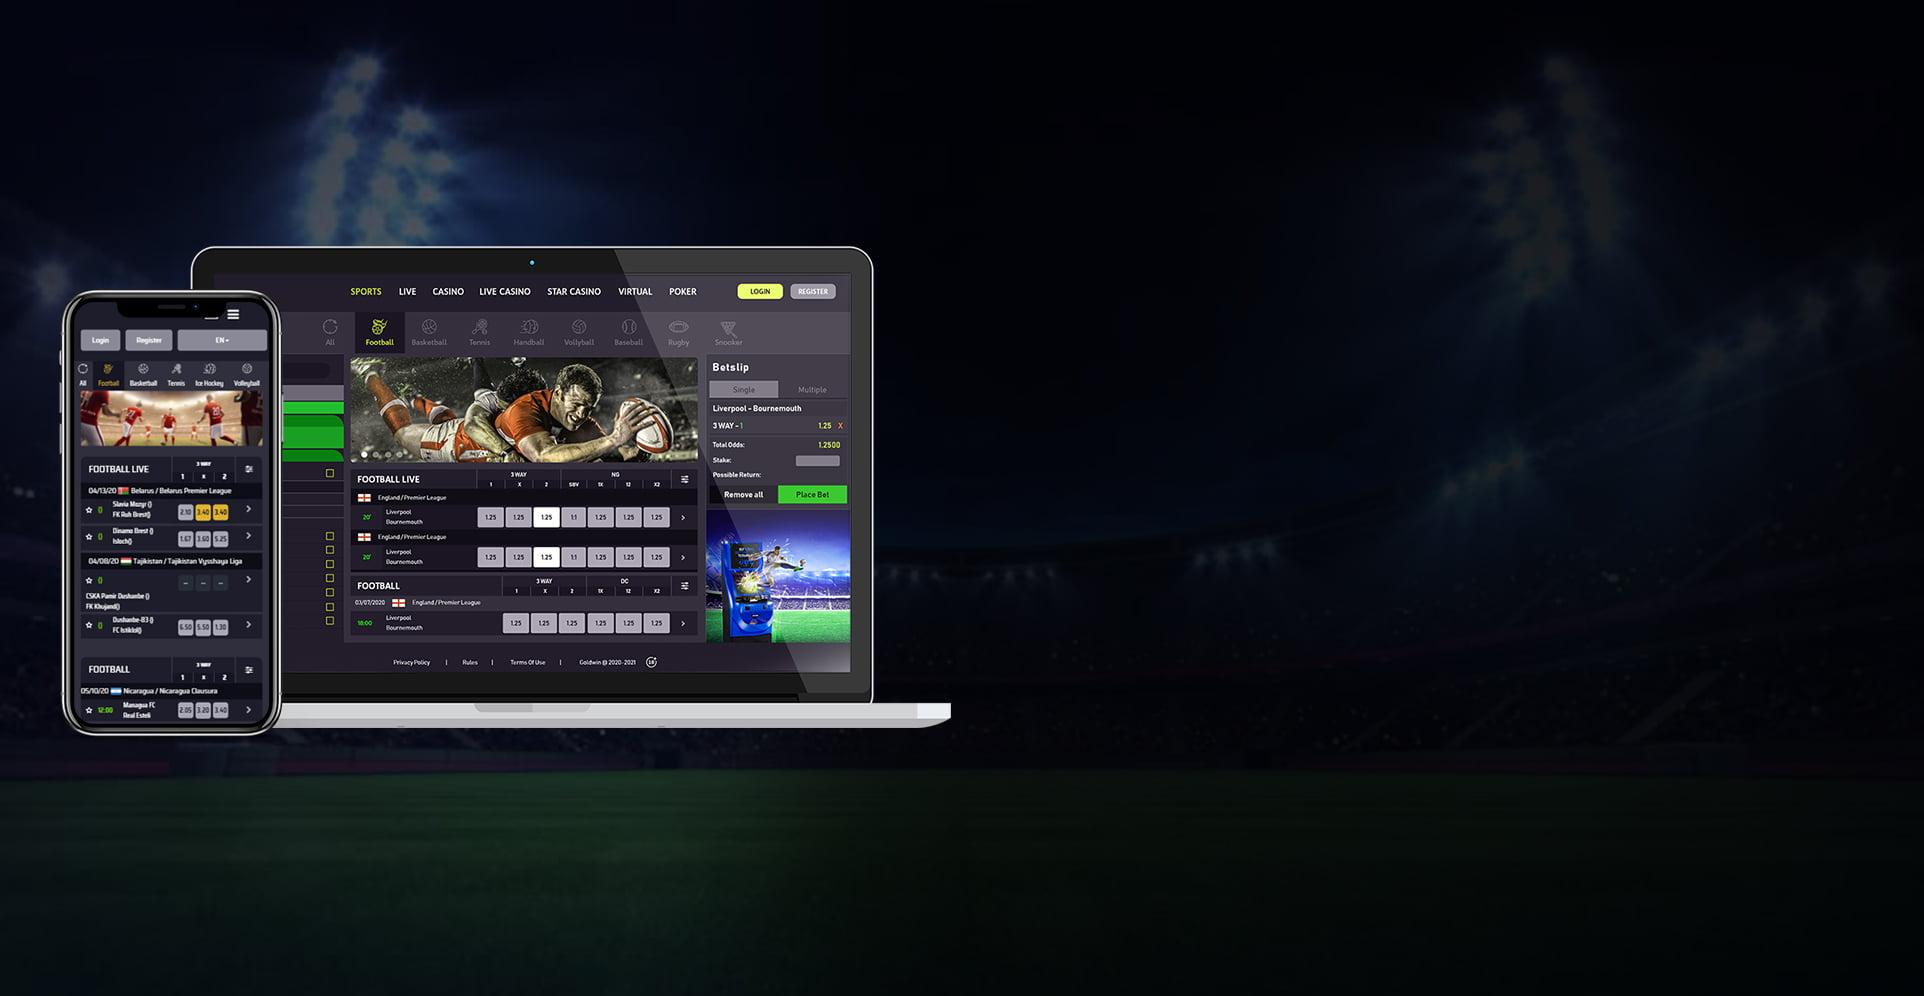 Sports betting software developers call me a safe bet im betting im not lyrics